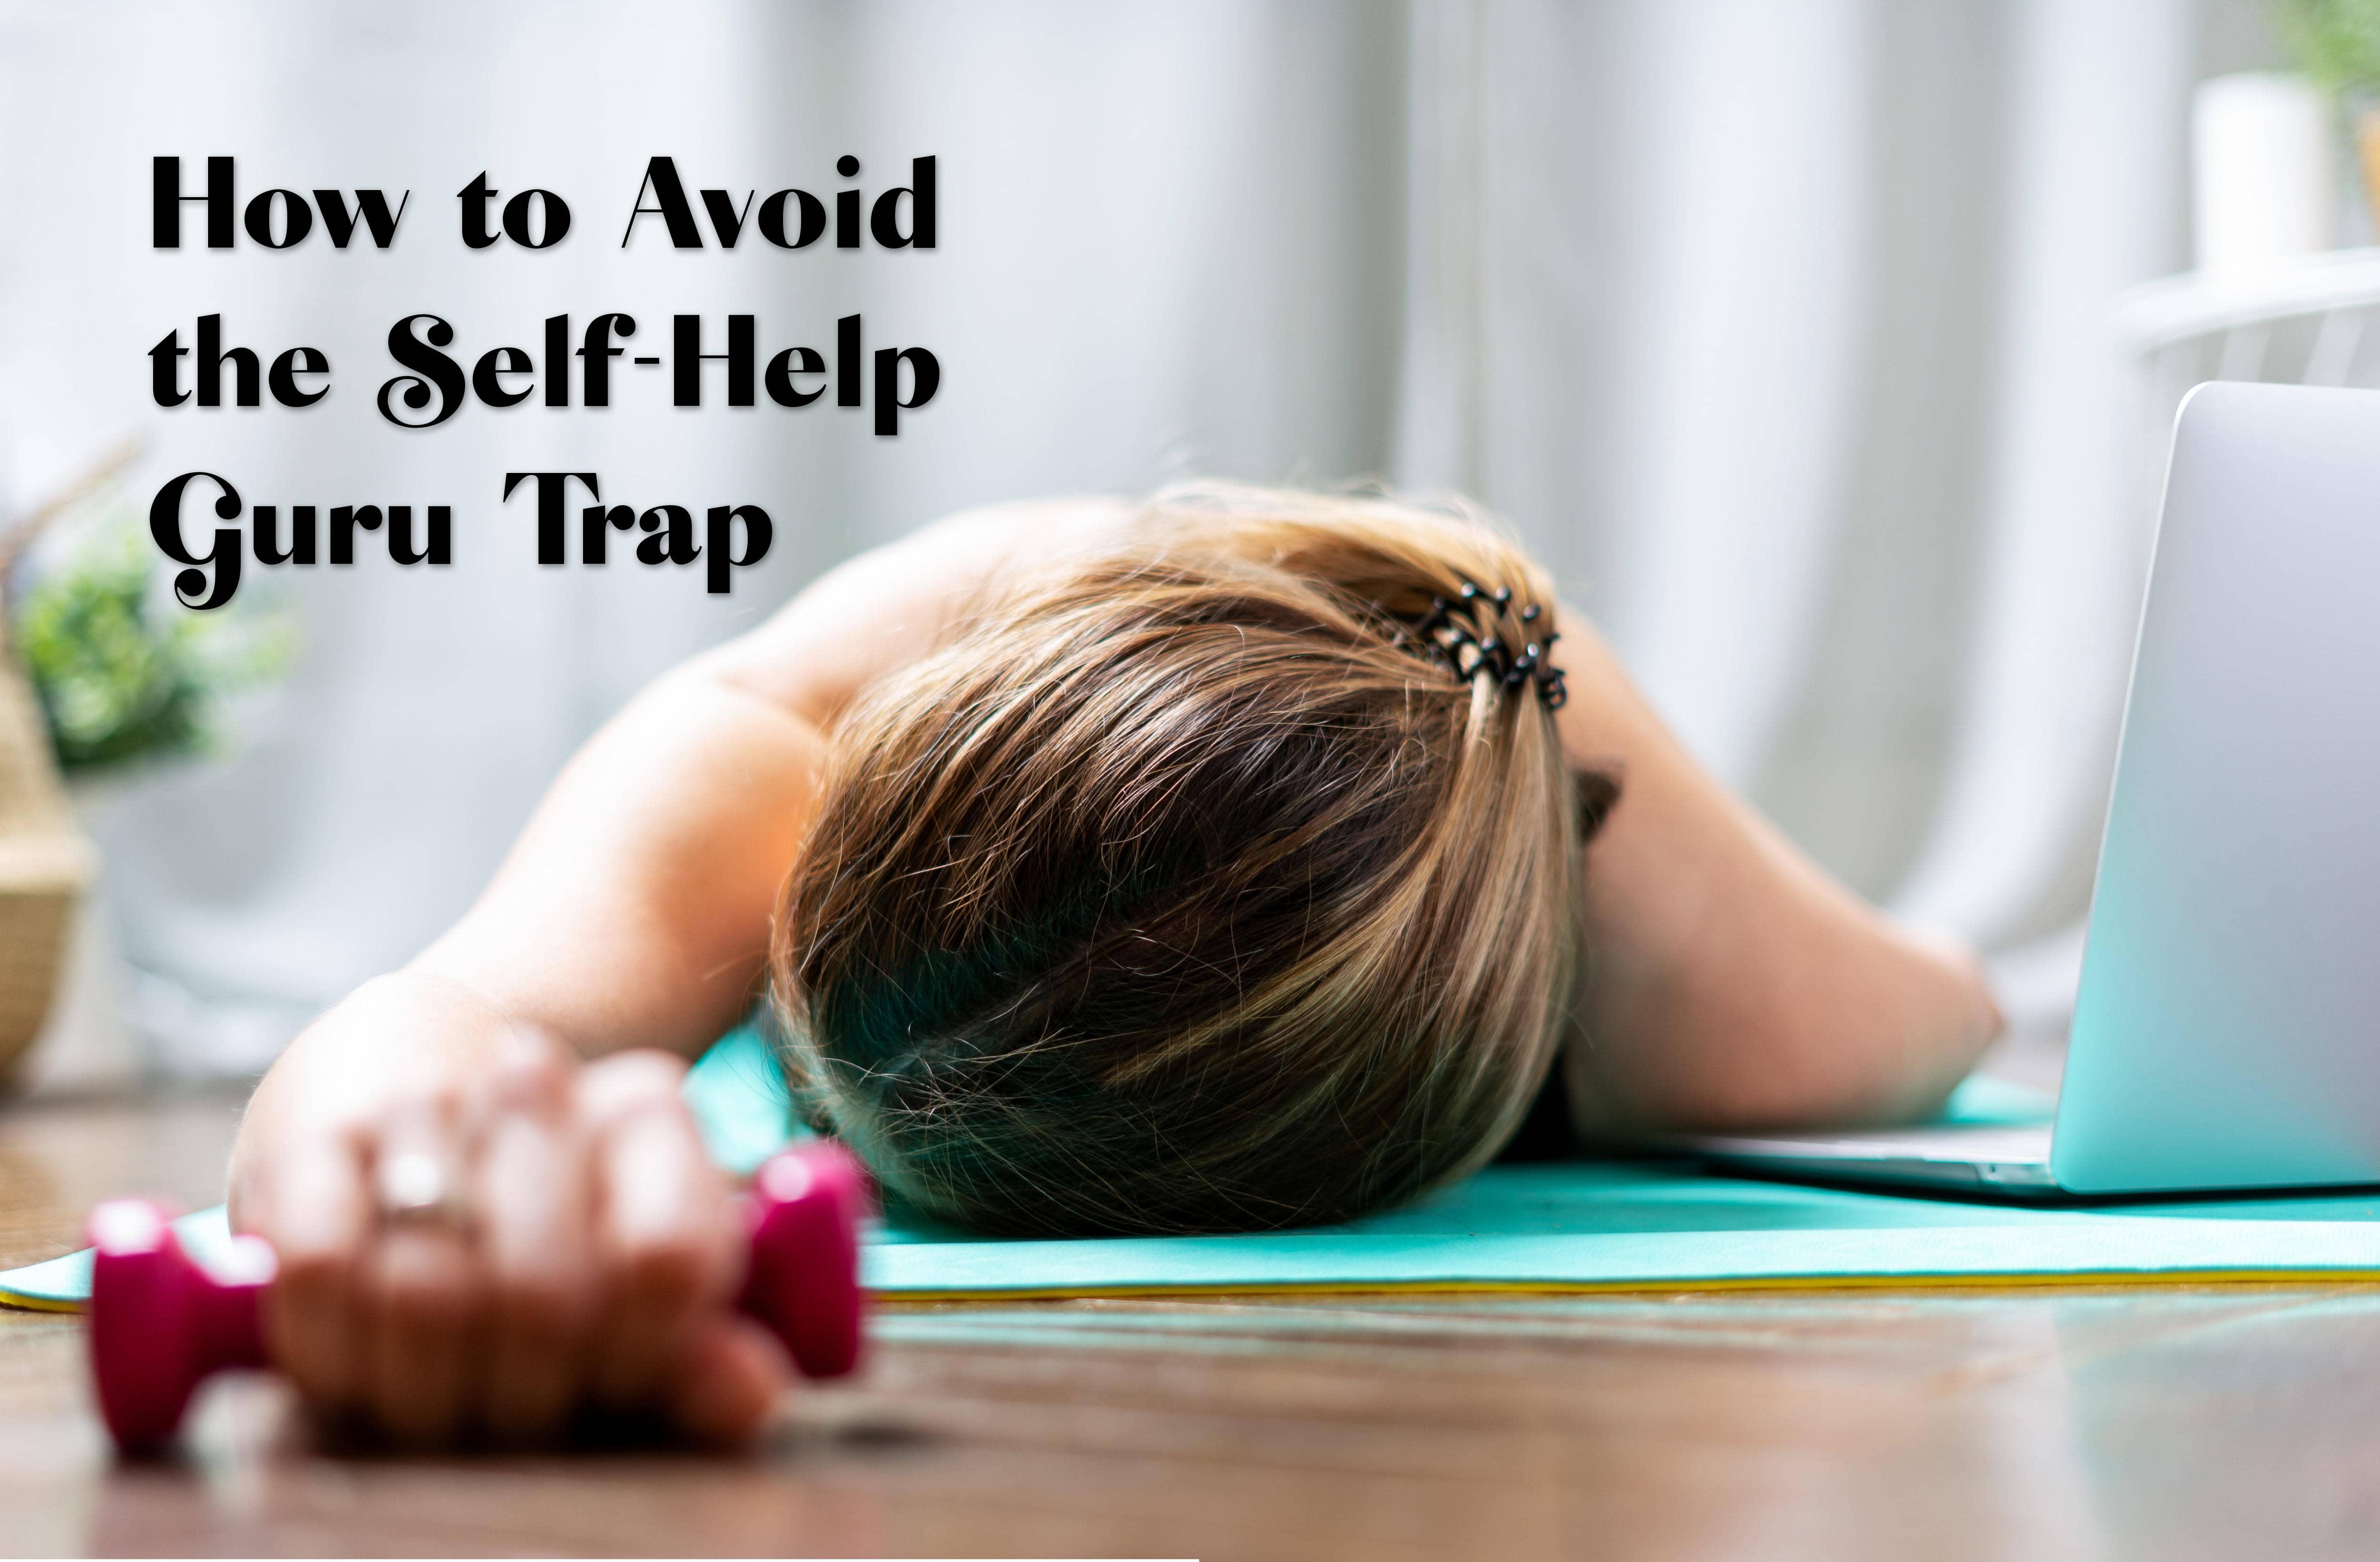 How to Avoid the Self-Help Guru